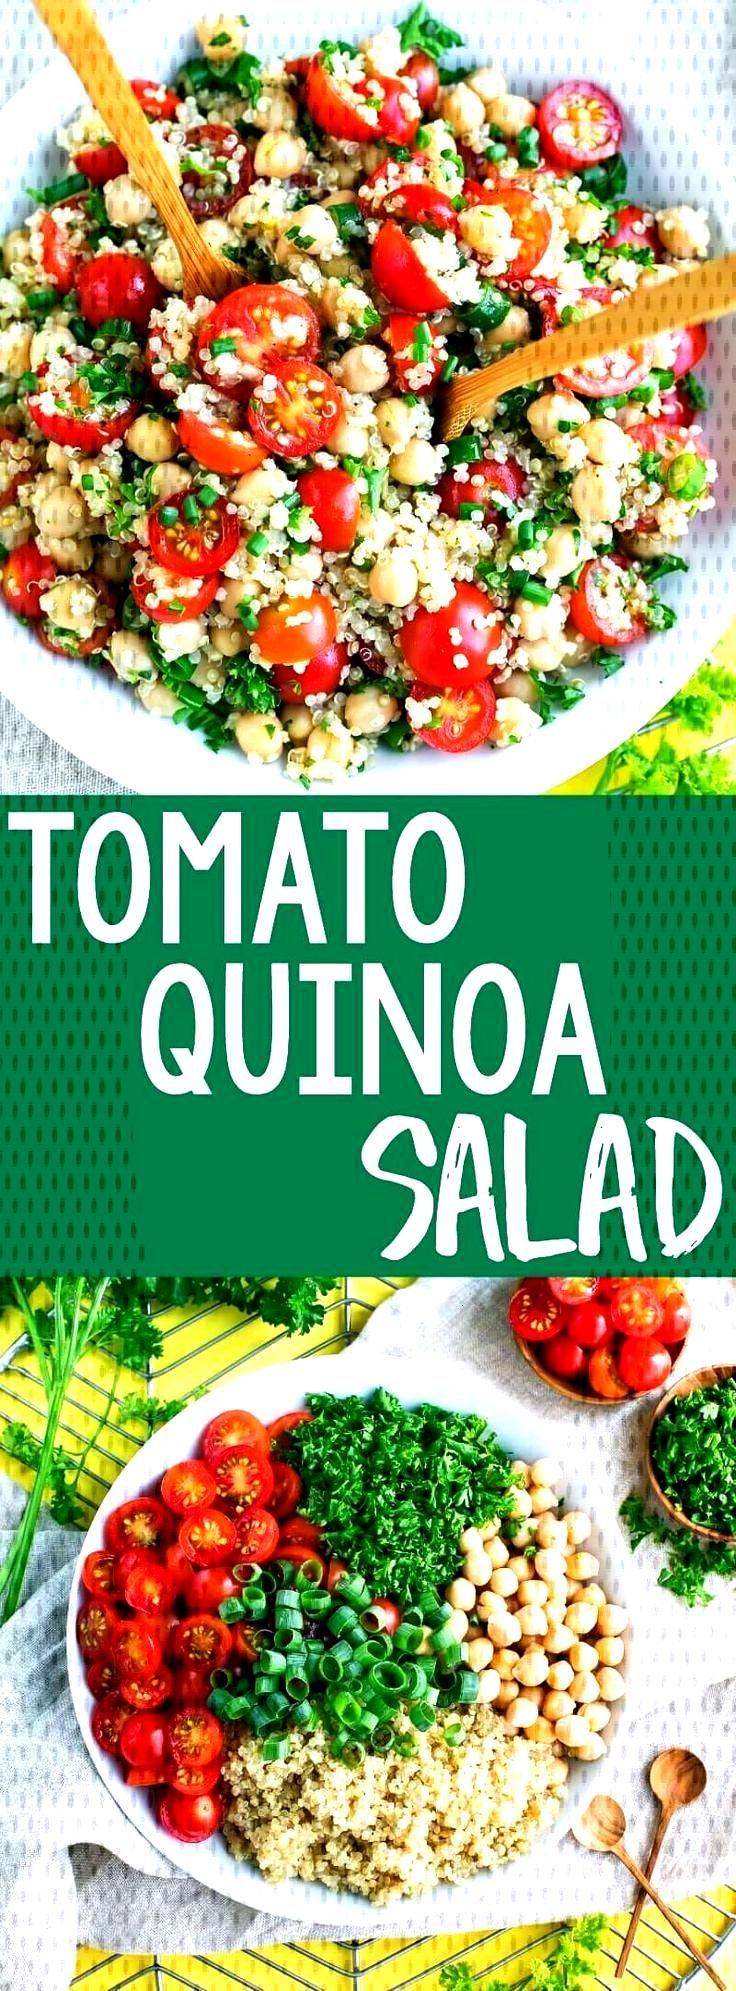 Tomato Quinoa Salad Broccoli salad is incredibly easy to make. Its healthy,... - -